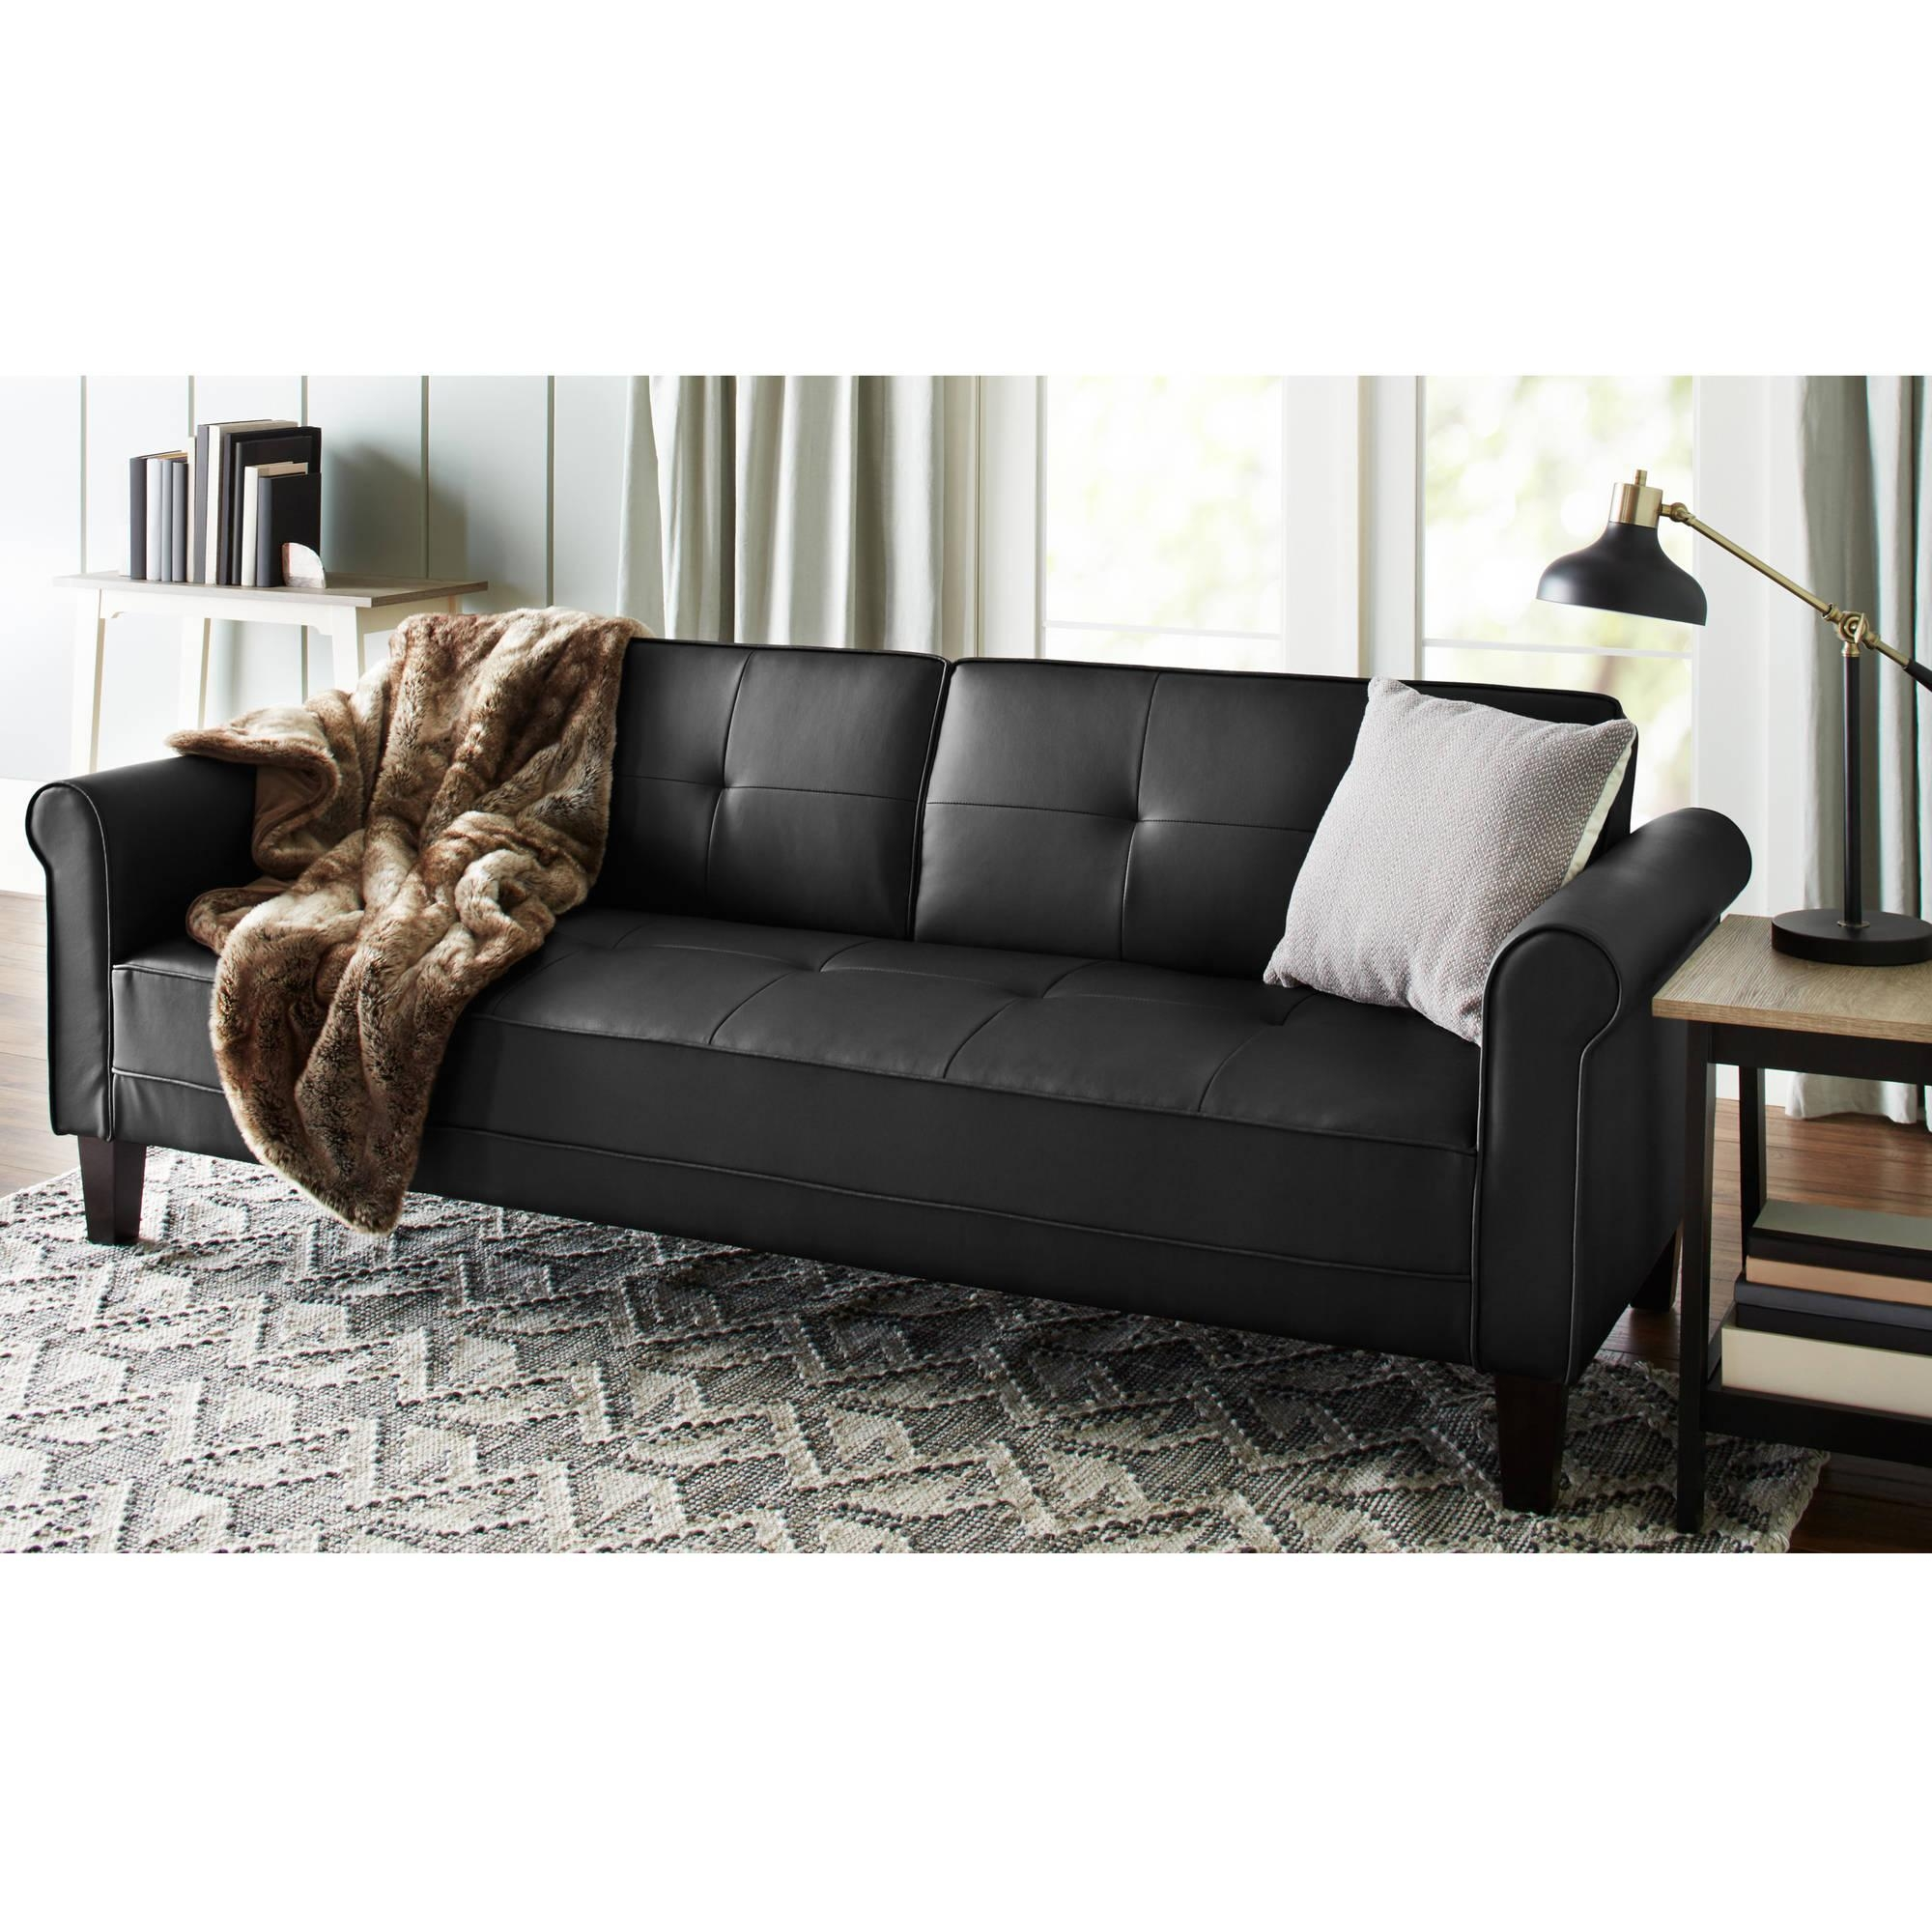 Furniture: Kmart Futon Bunk Bed | Futon Beds Walmart | Kebo Futon Inside Kmart Futon Beds (Image 6 of 20)